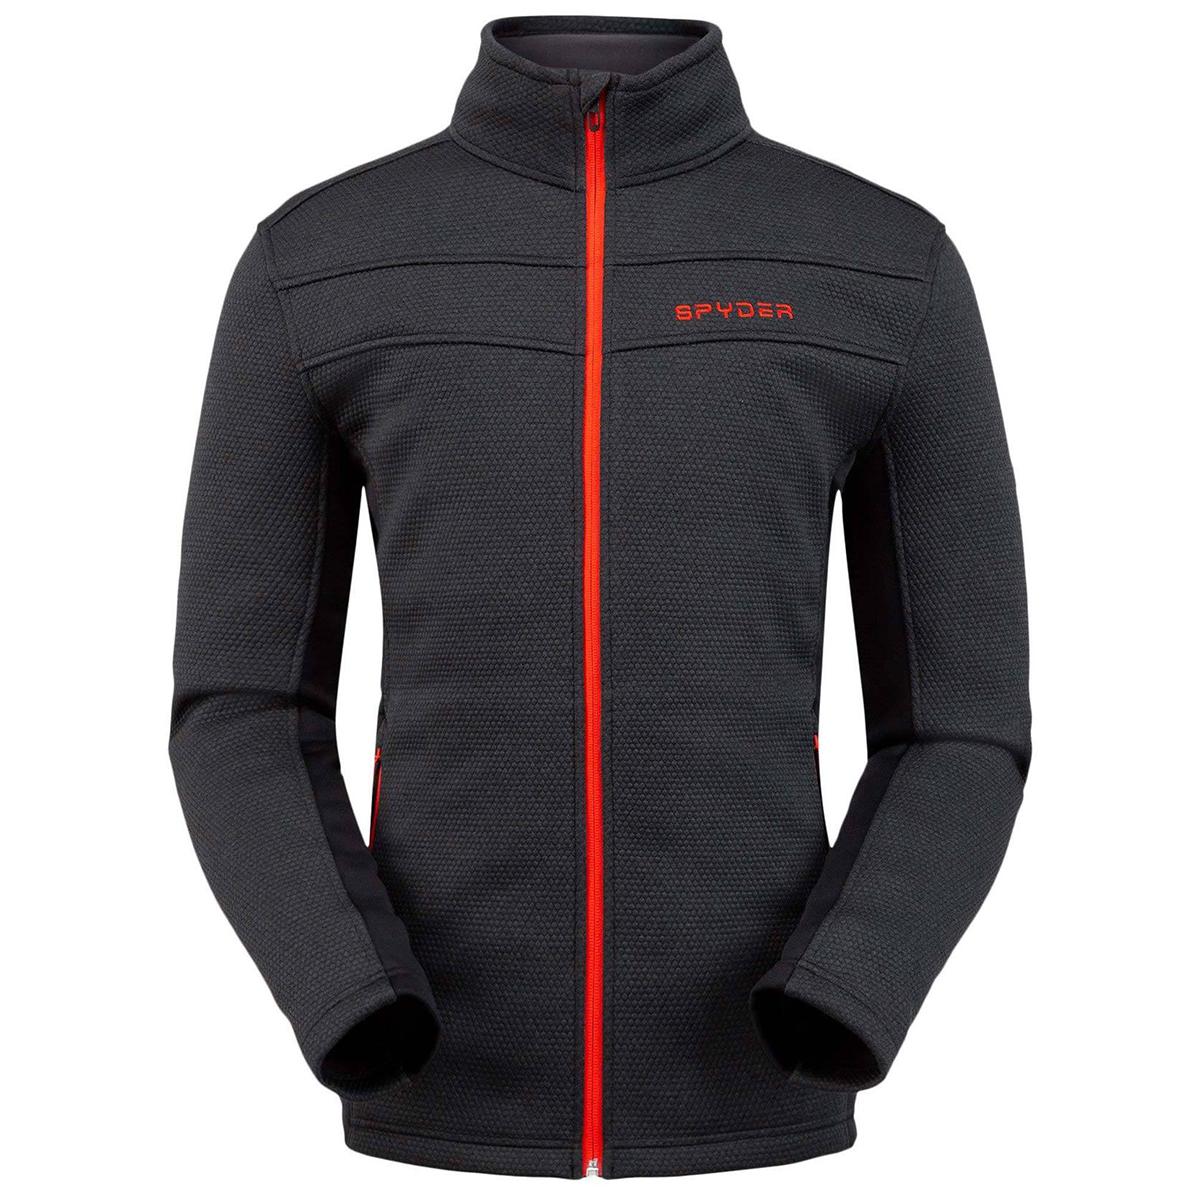 Spyder Men's Encore Full Zip Fleece Jacket - Black, M